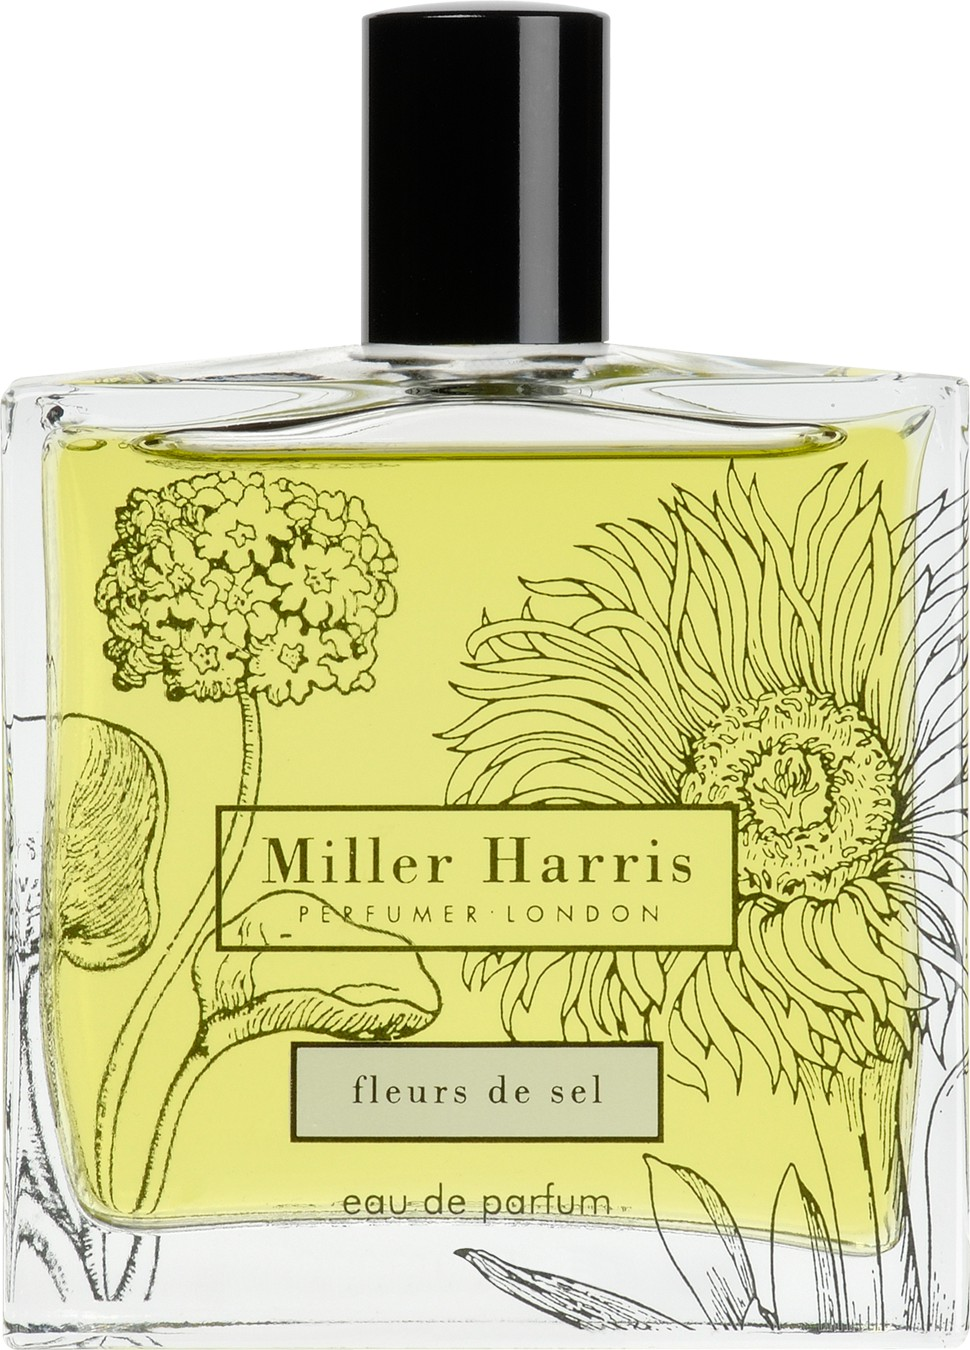 Miller Harris Fleurs de Sel аромат для женщин